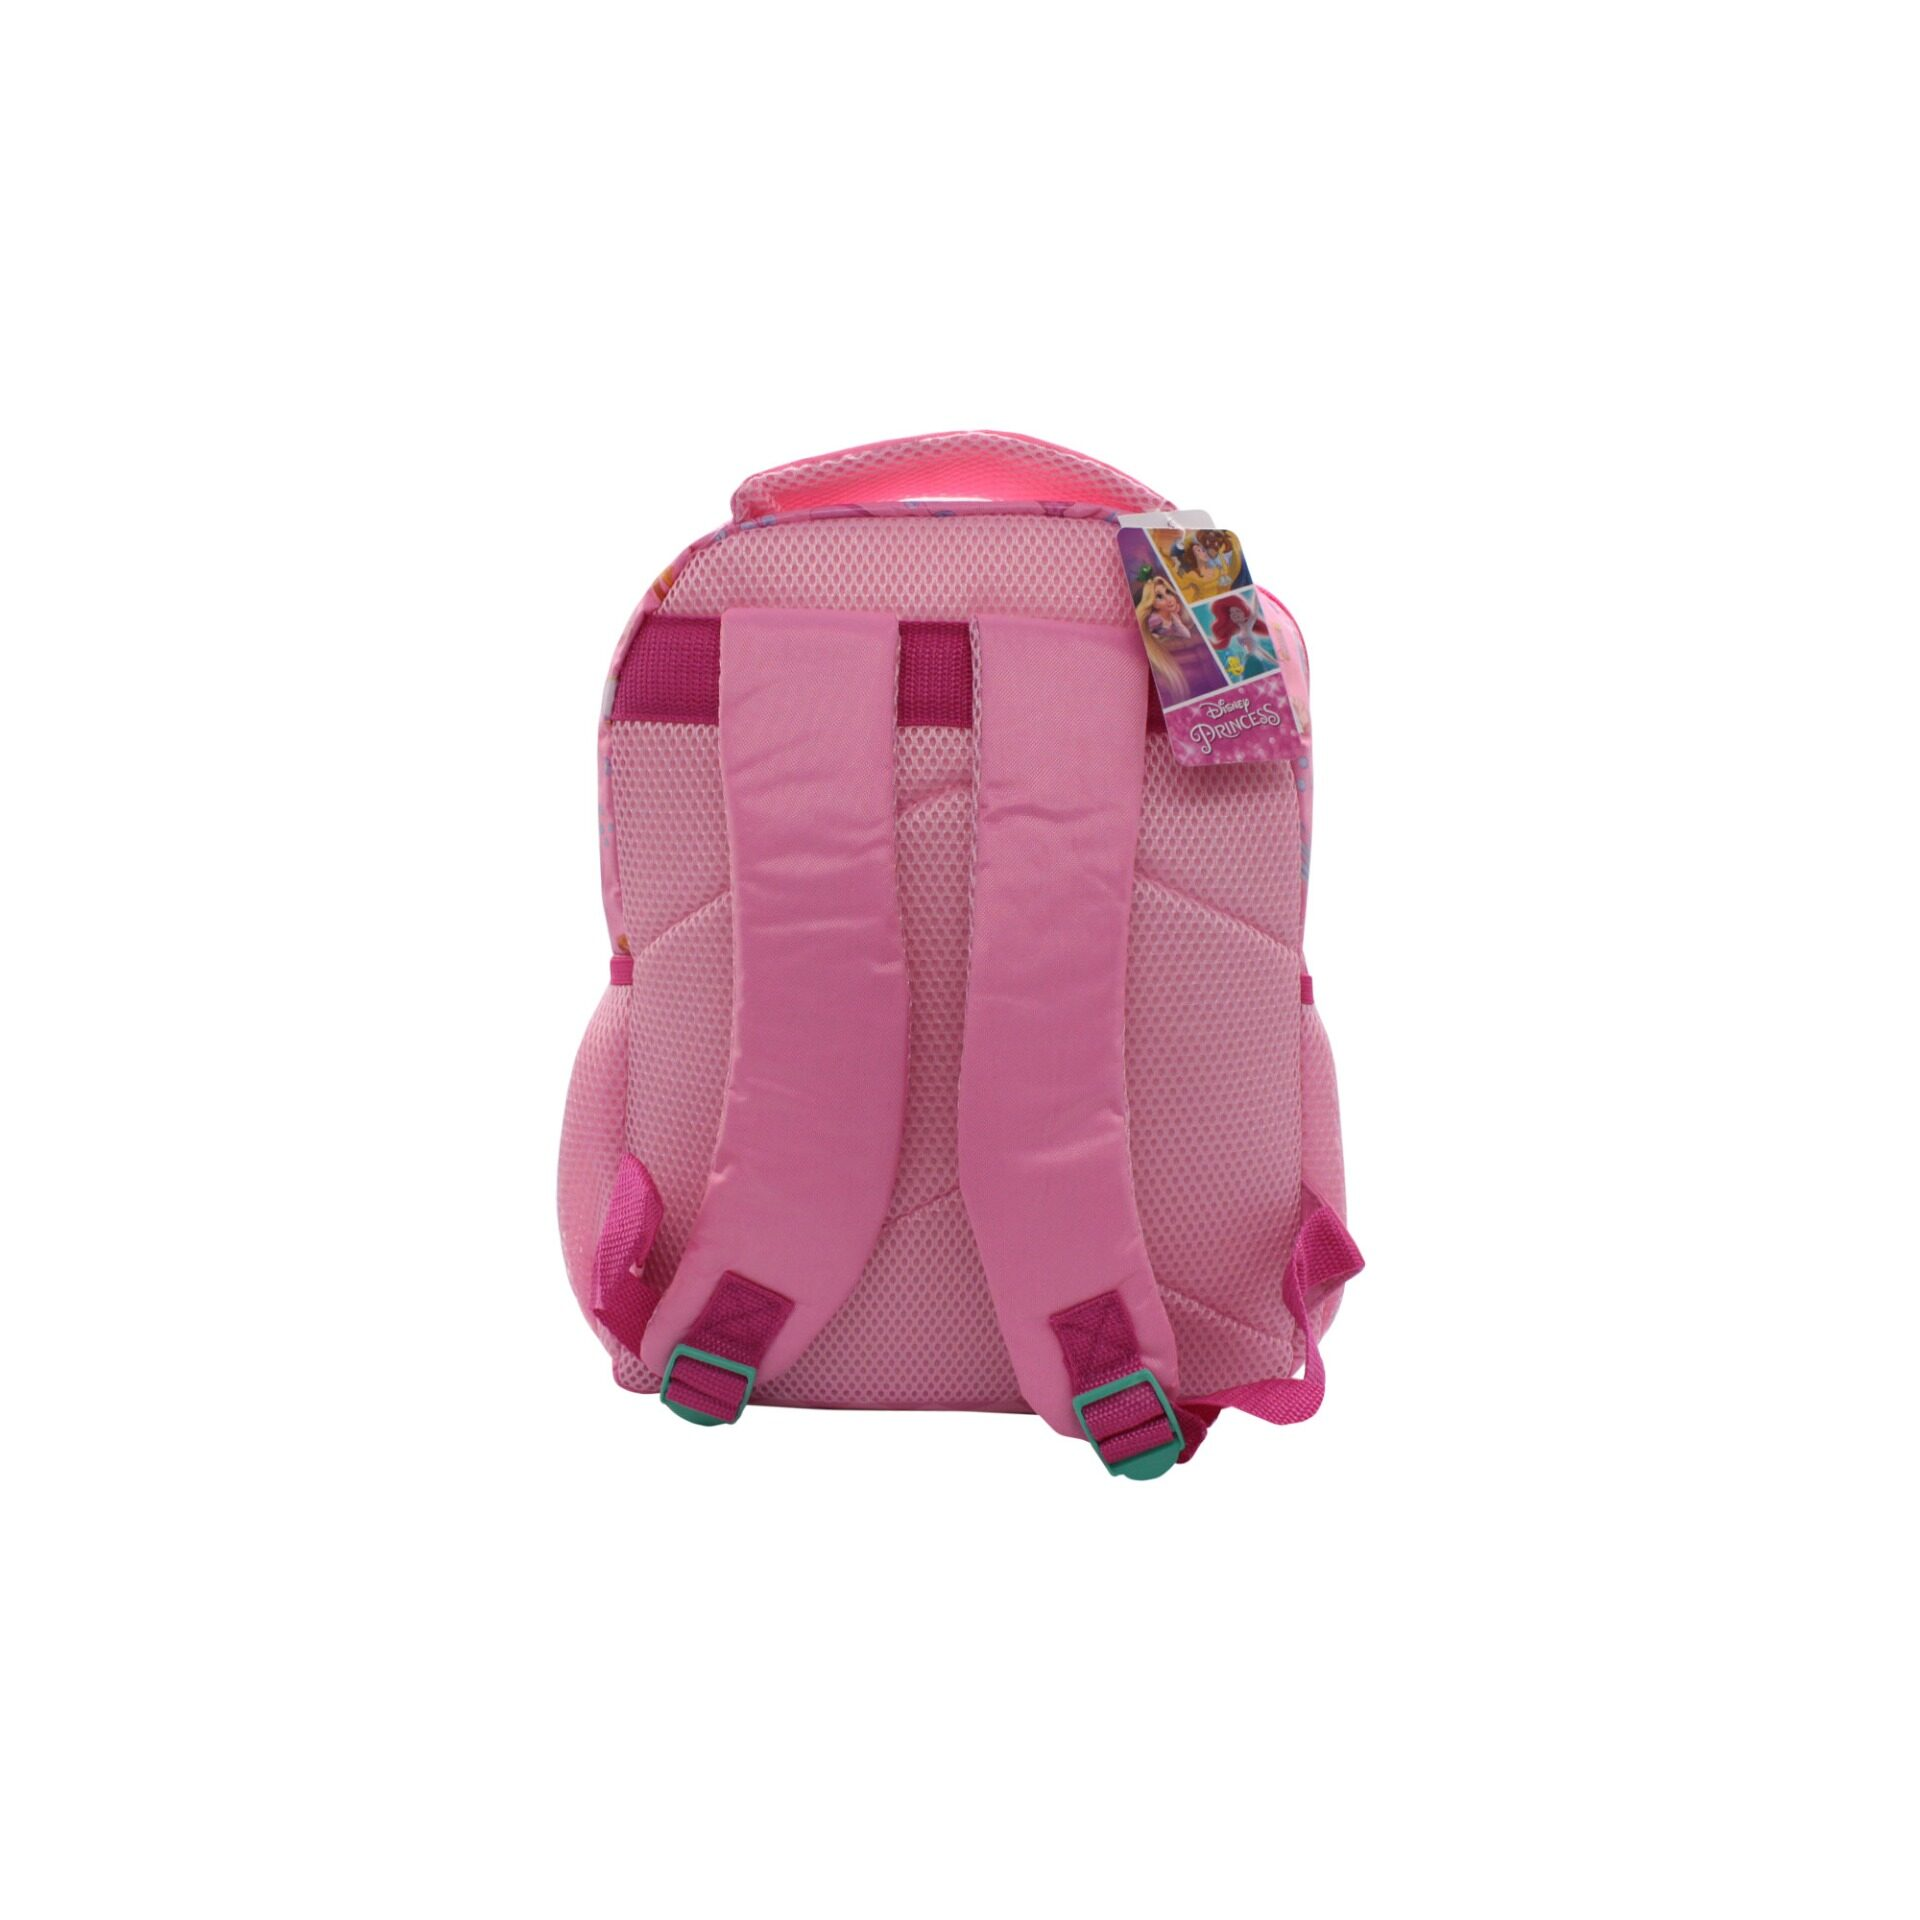 Disney Princess Be True Castle With Front Zipper Pouch Kids Girls Pre School Bag (Pink)